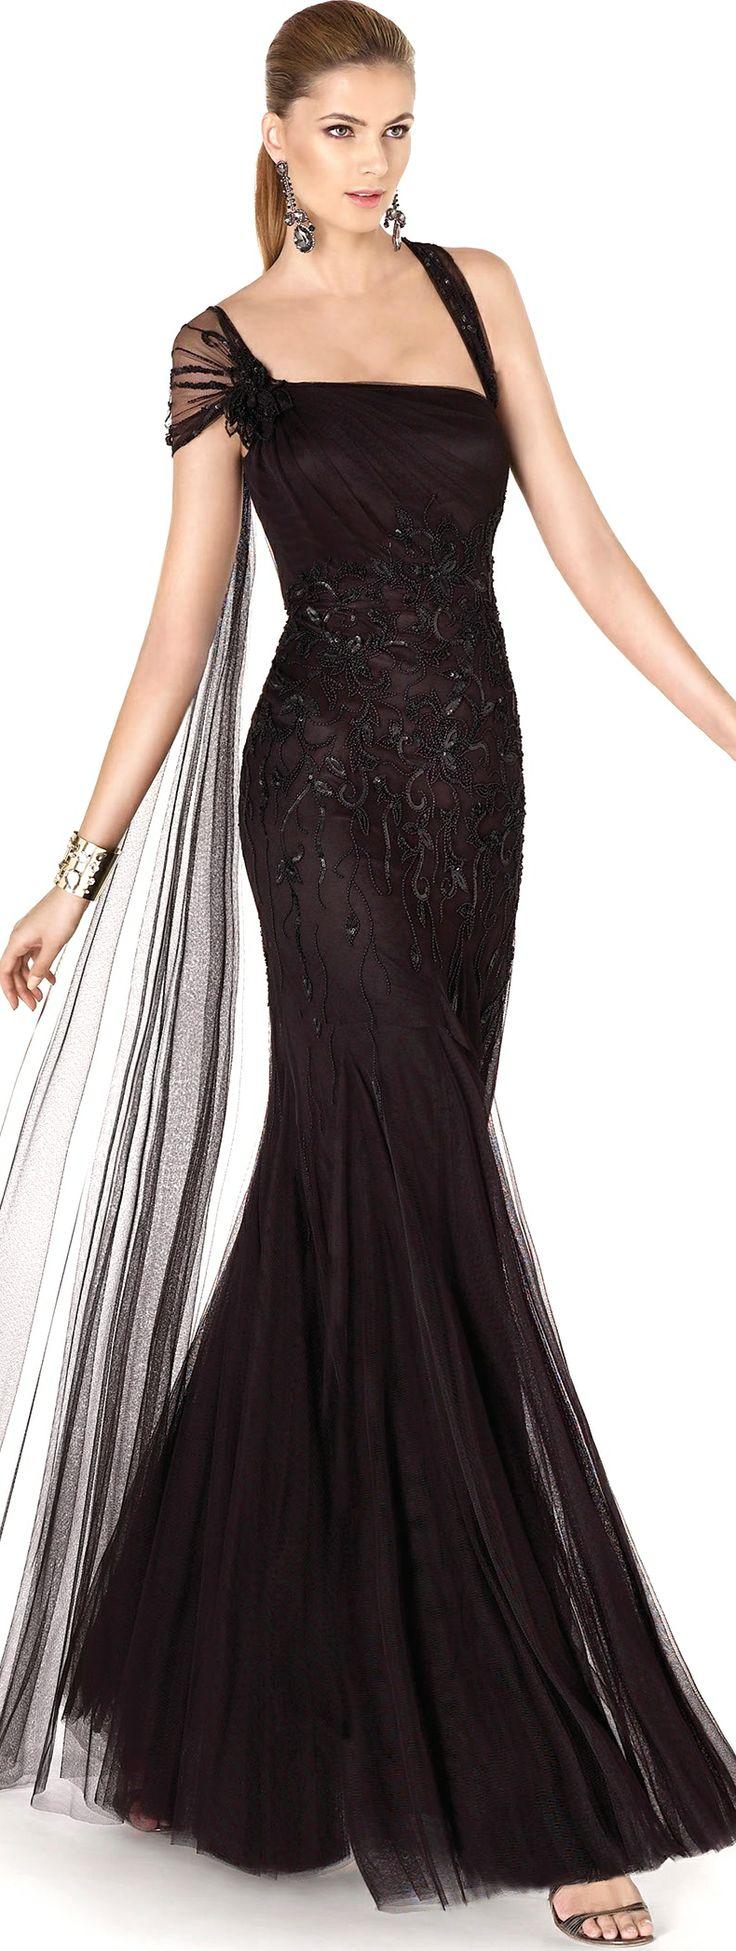 Pronovias Cocktail Collection 2015 | Keep The Glamour ♡ ✤ LadyLuxury .jaglady